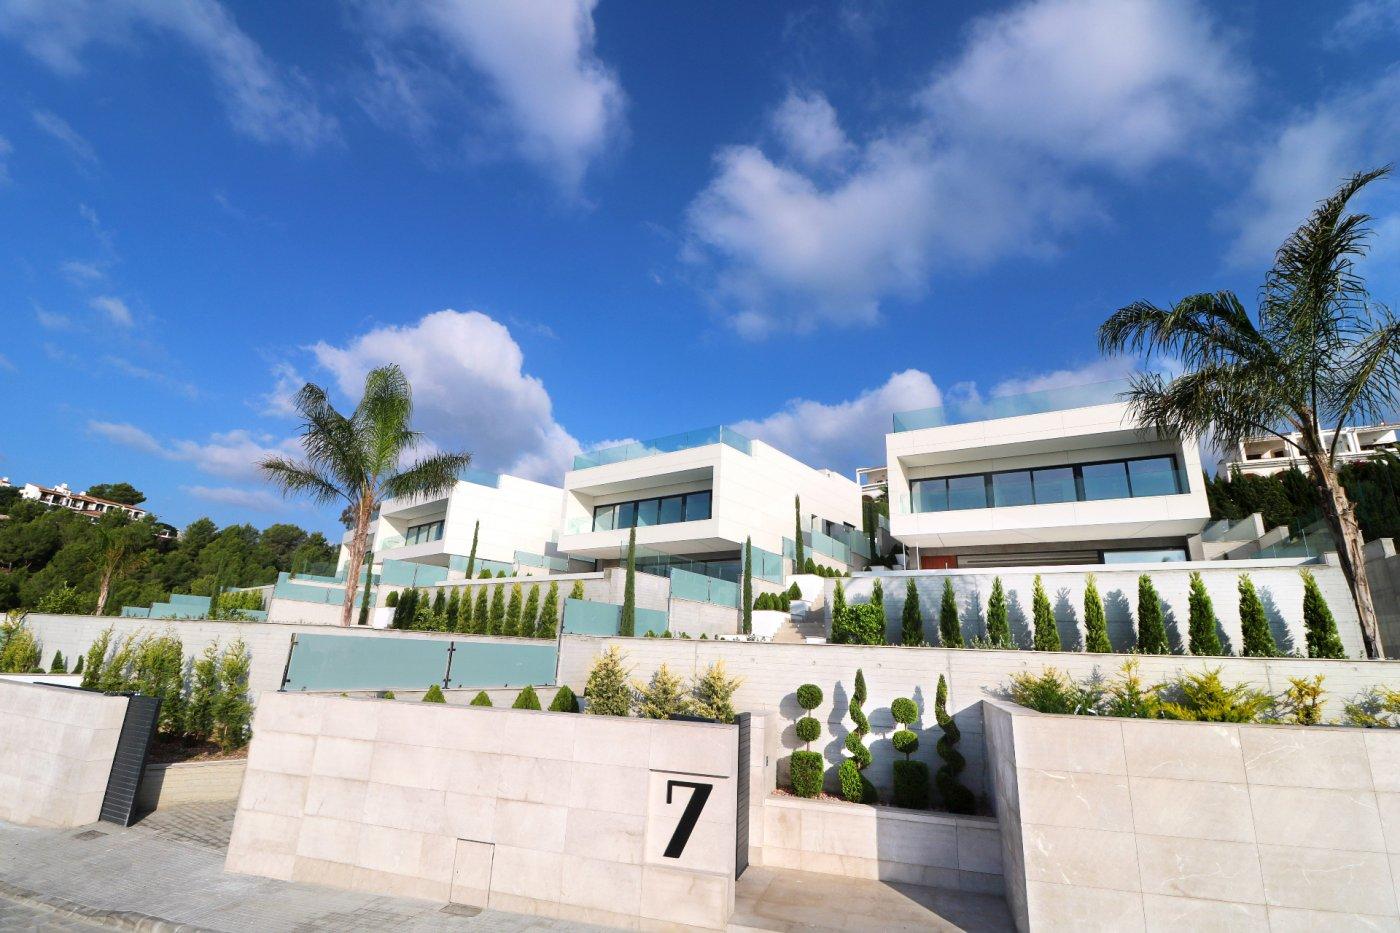 Villas - msh-00352